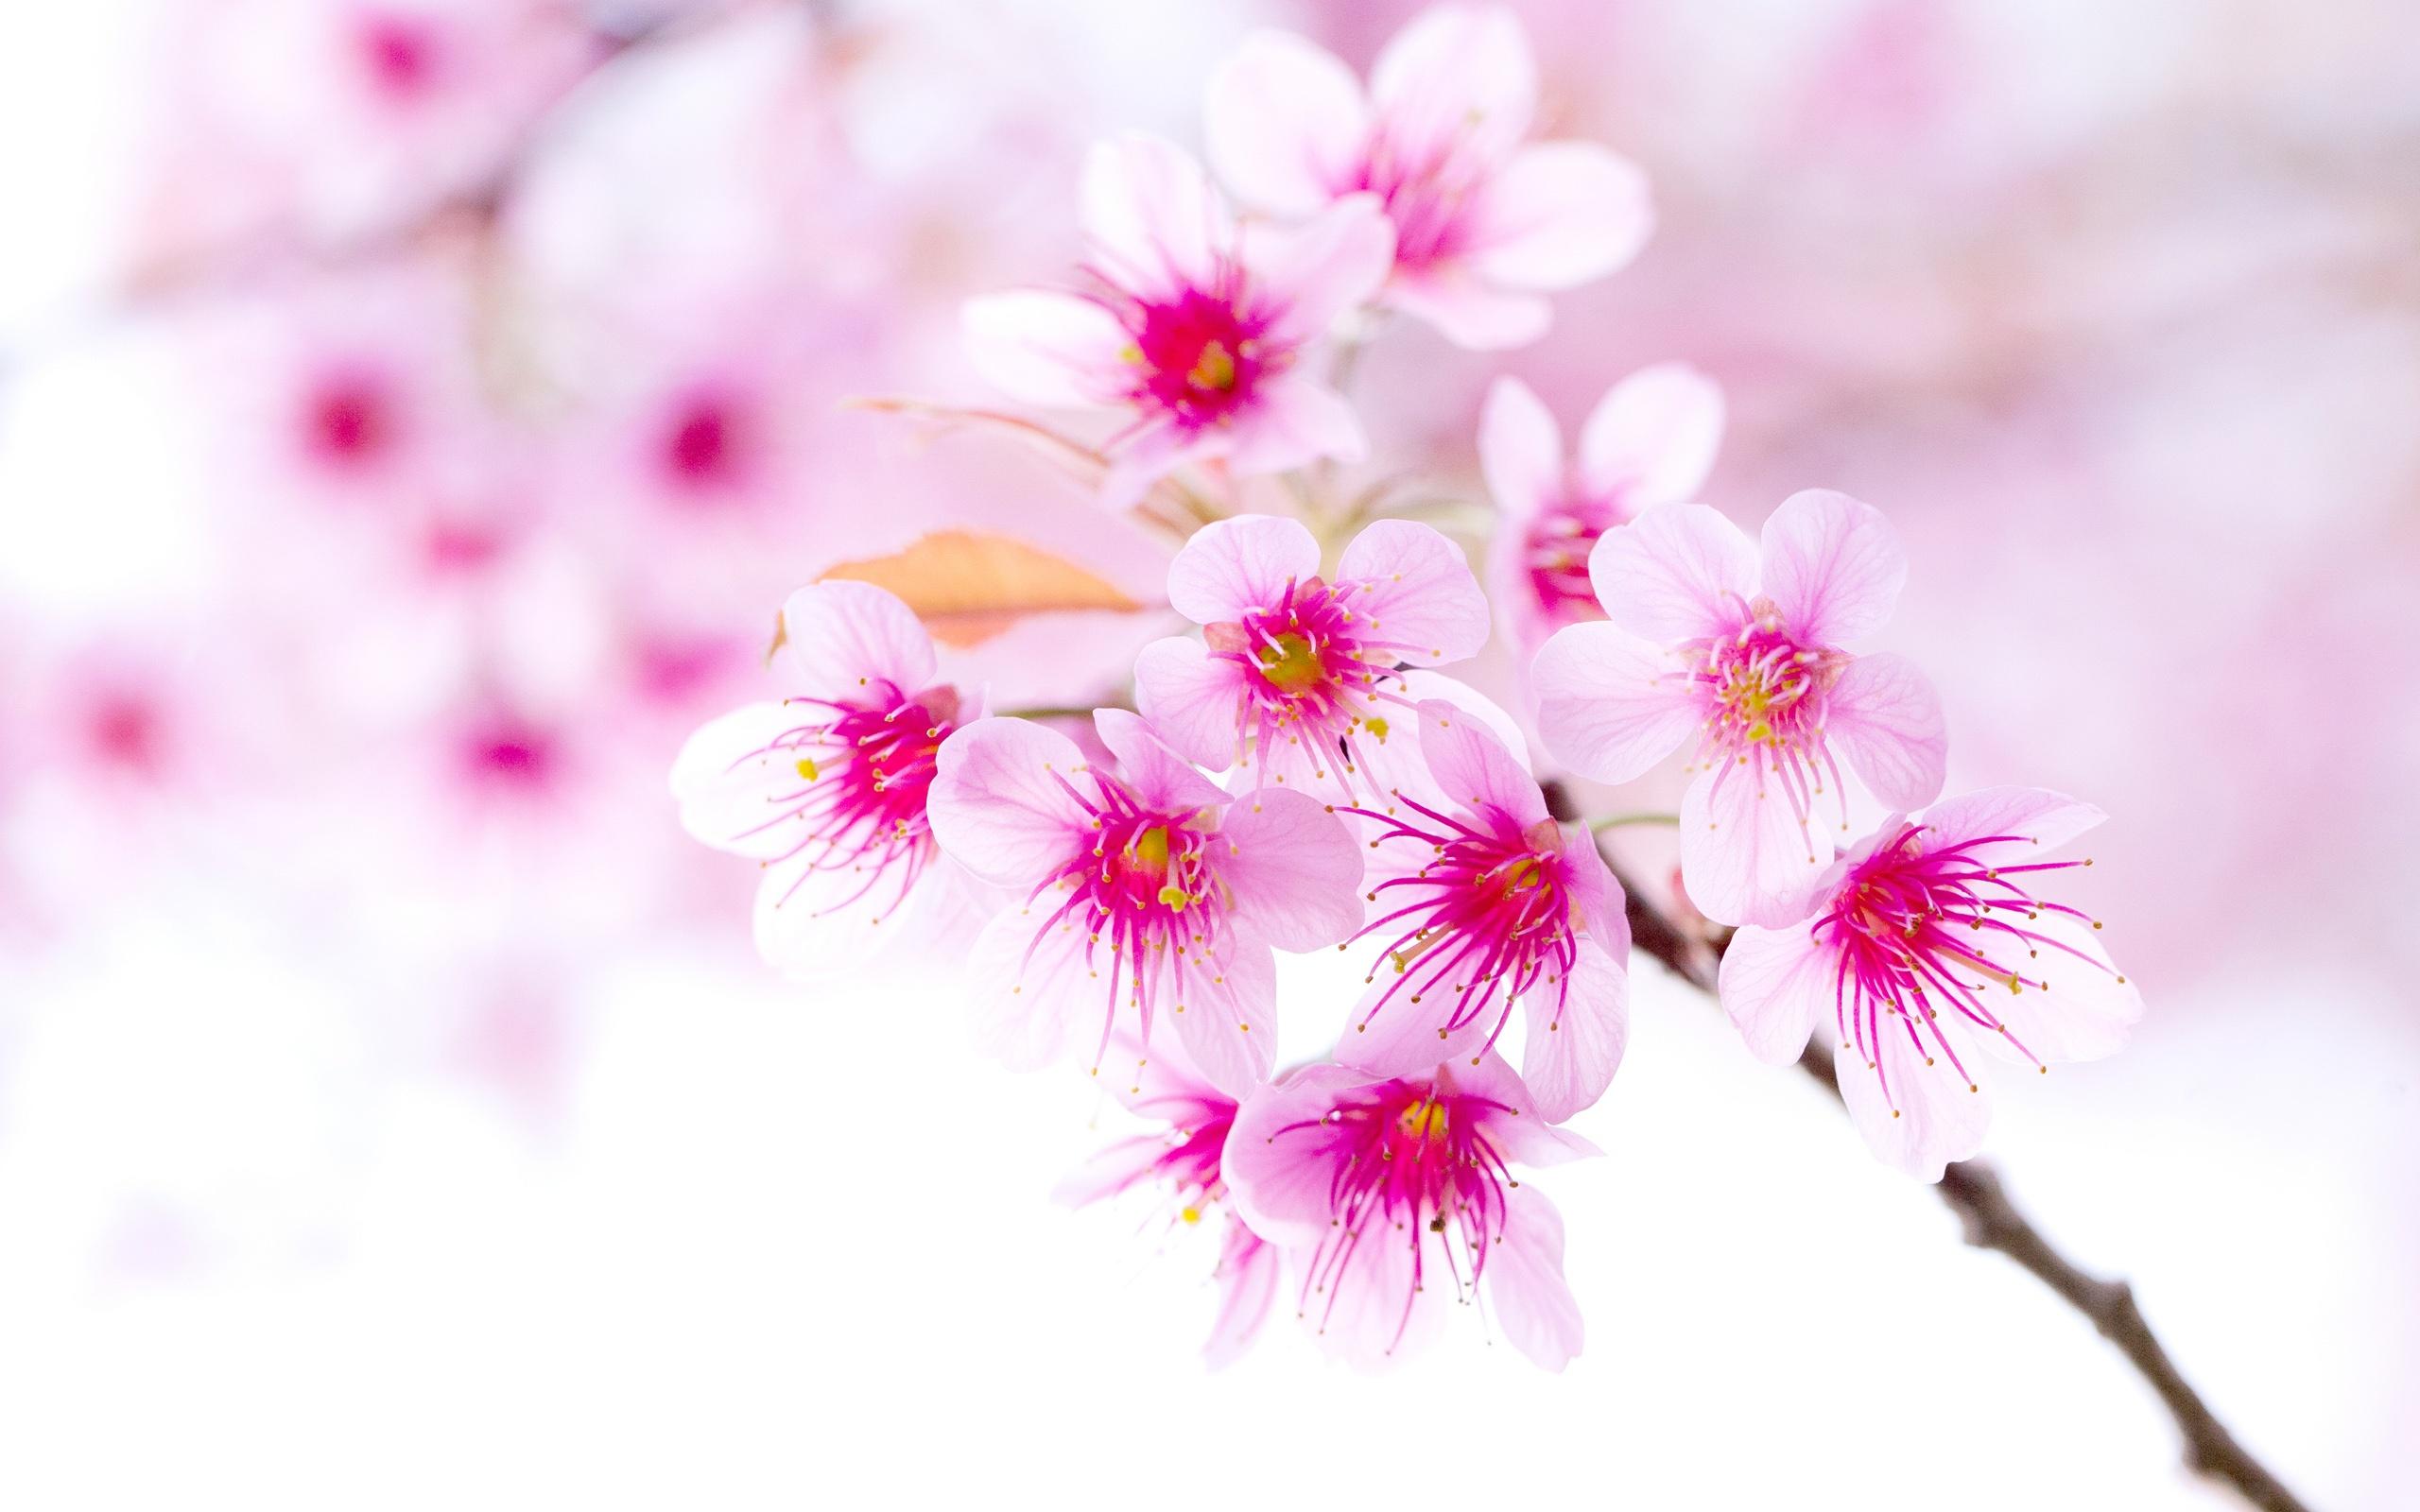 ... rosa Blumen close-up ...